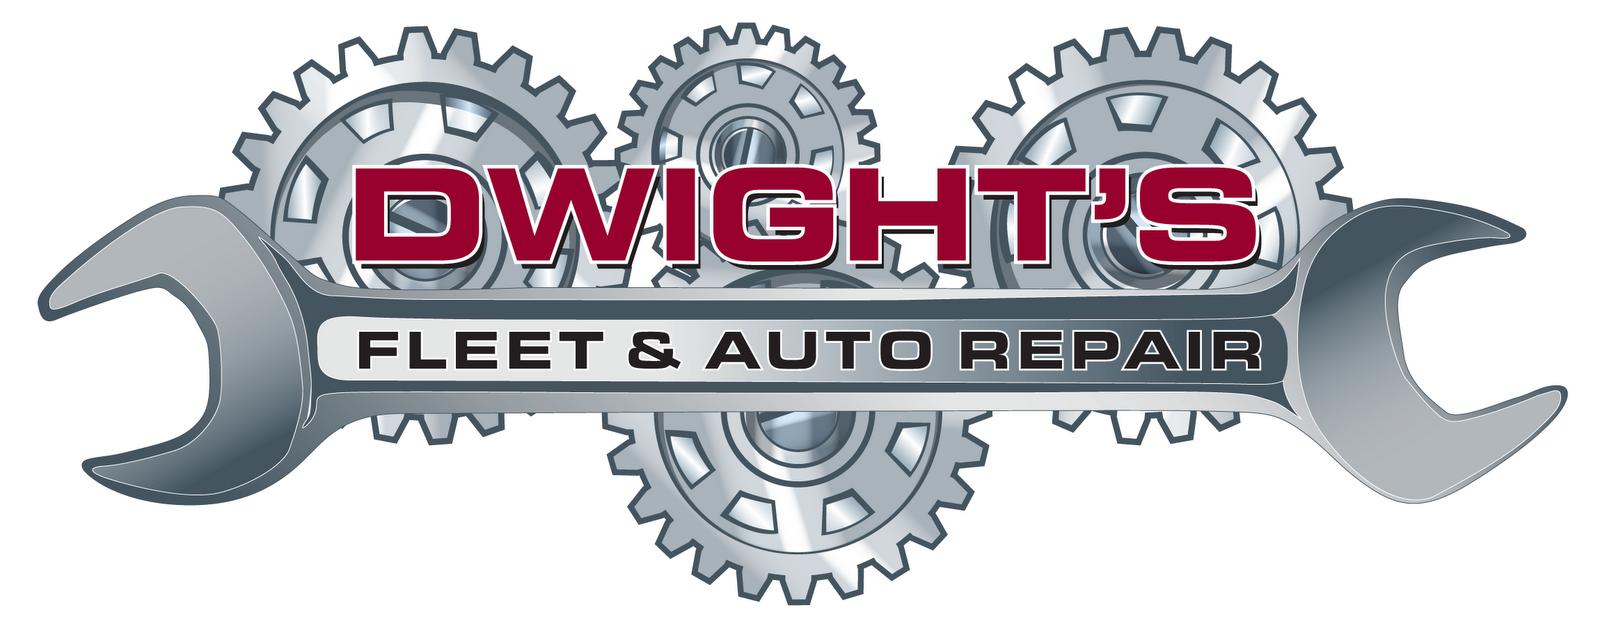 Mechanic Logos